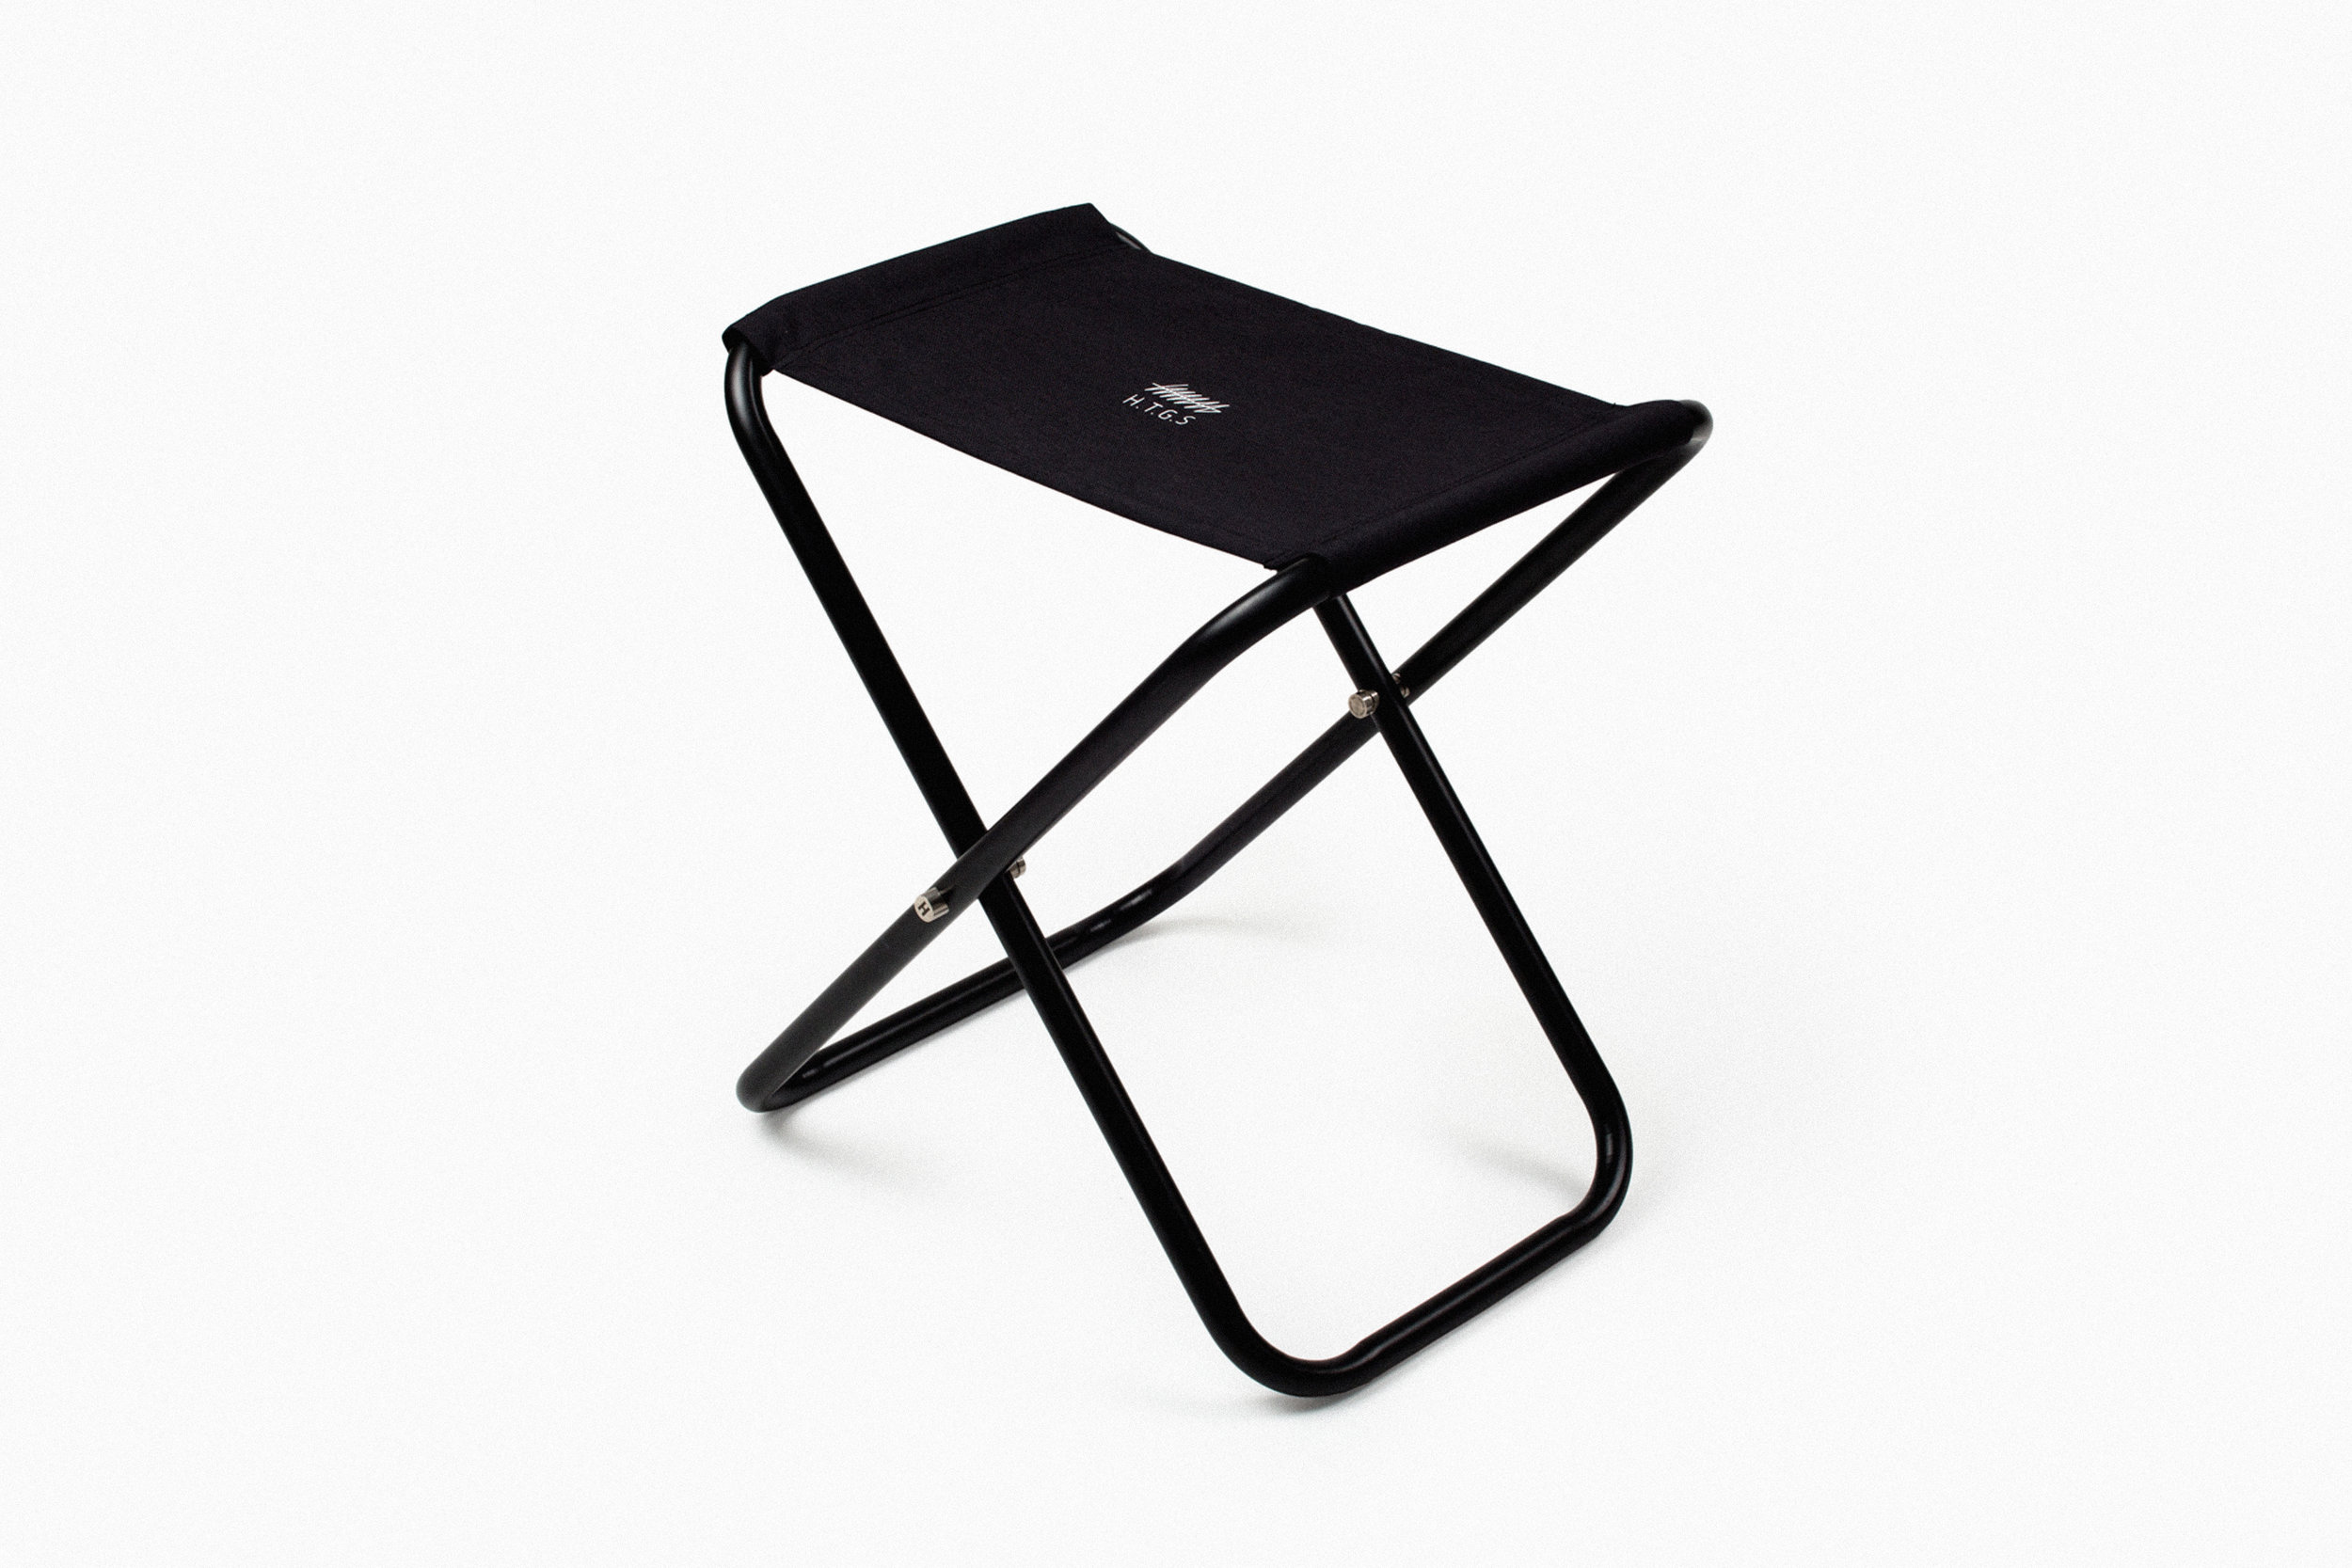 SBSRFC_Main_Blog_Image_Hutan_Field_Chair_2.jpg